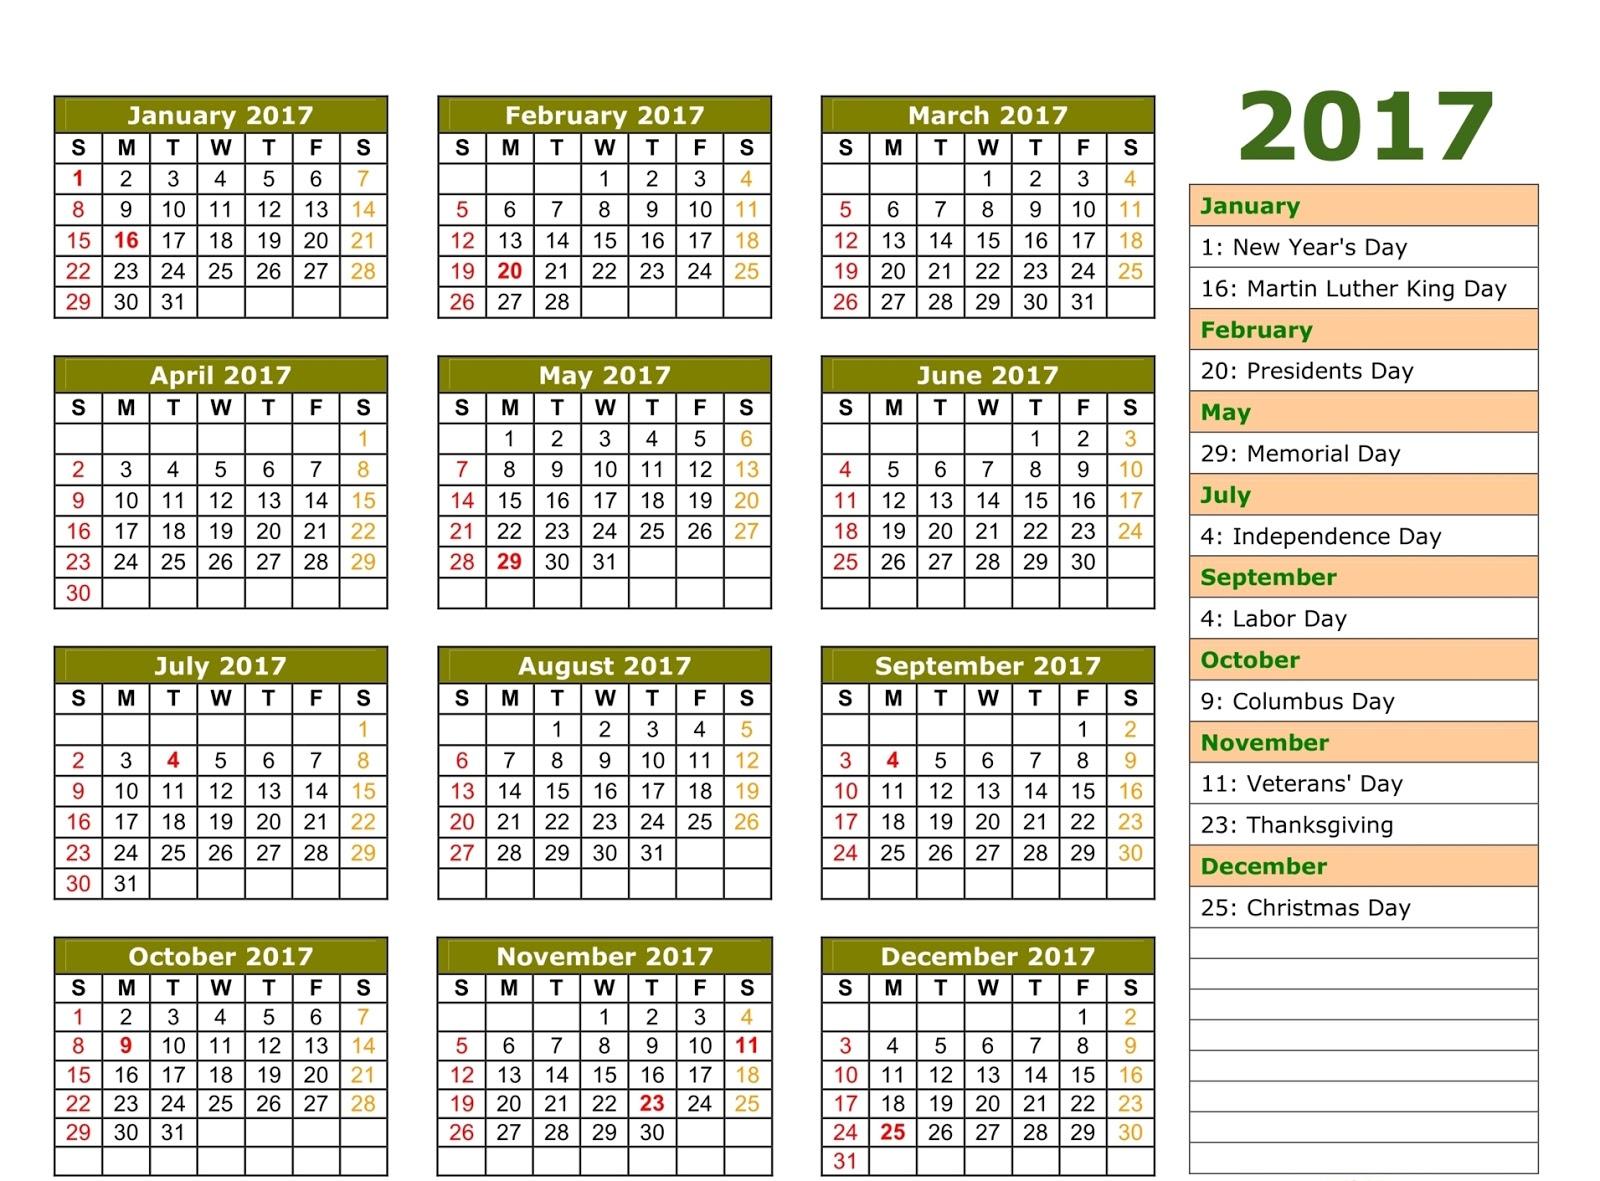 ... 2017 calendar with holidays, calendar 2017 with holidays, bank holiday